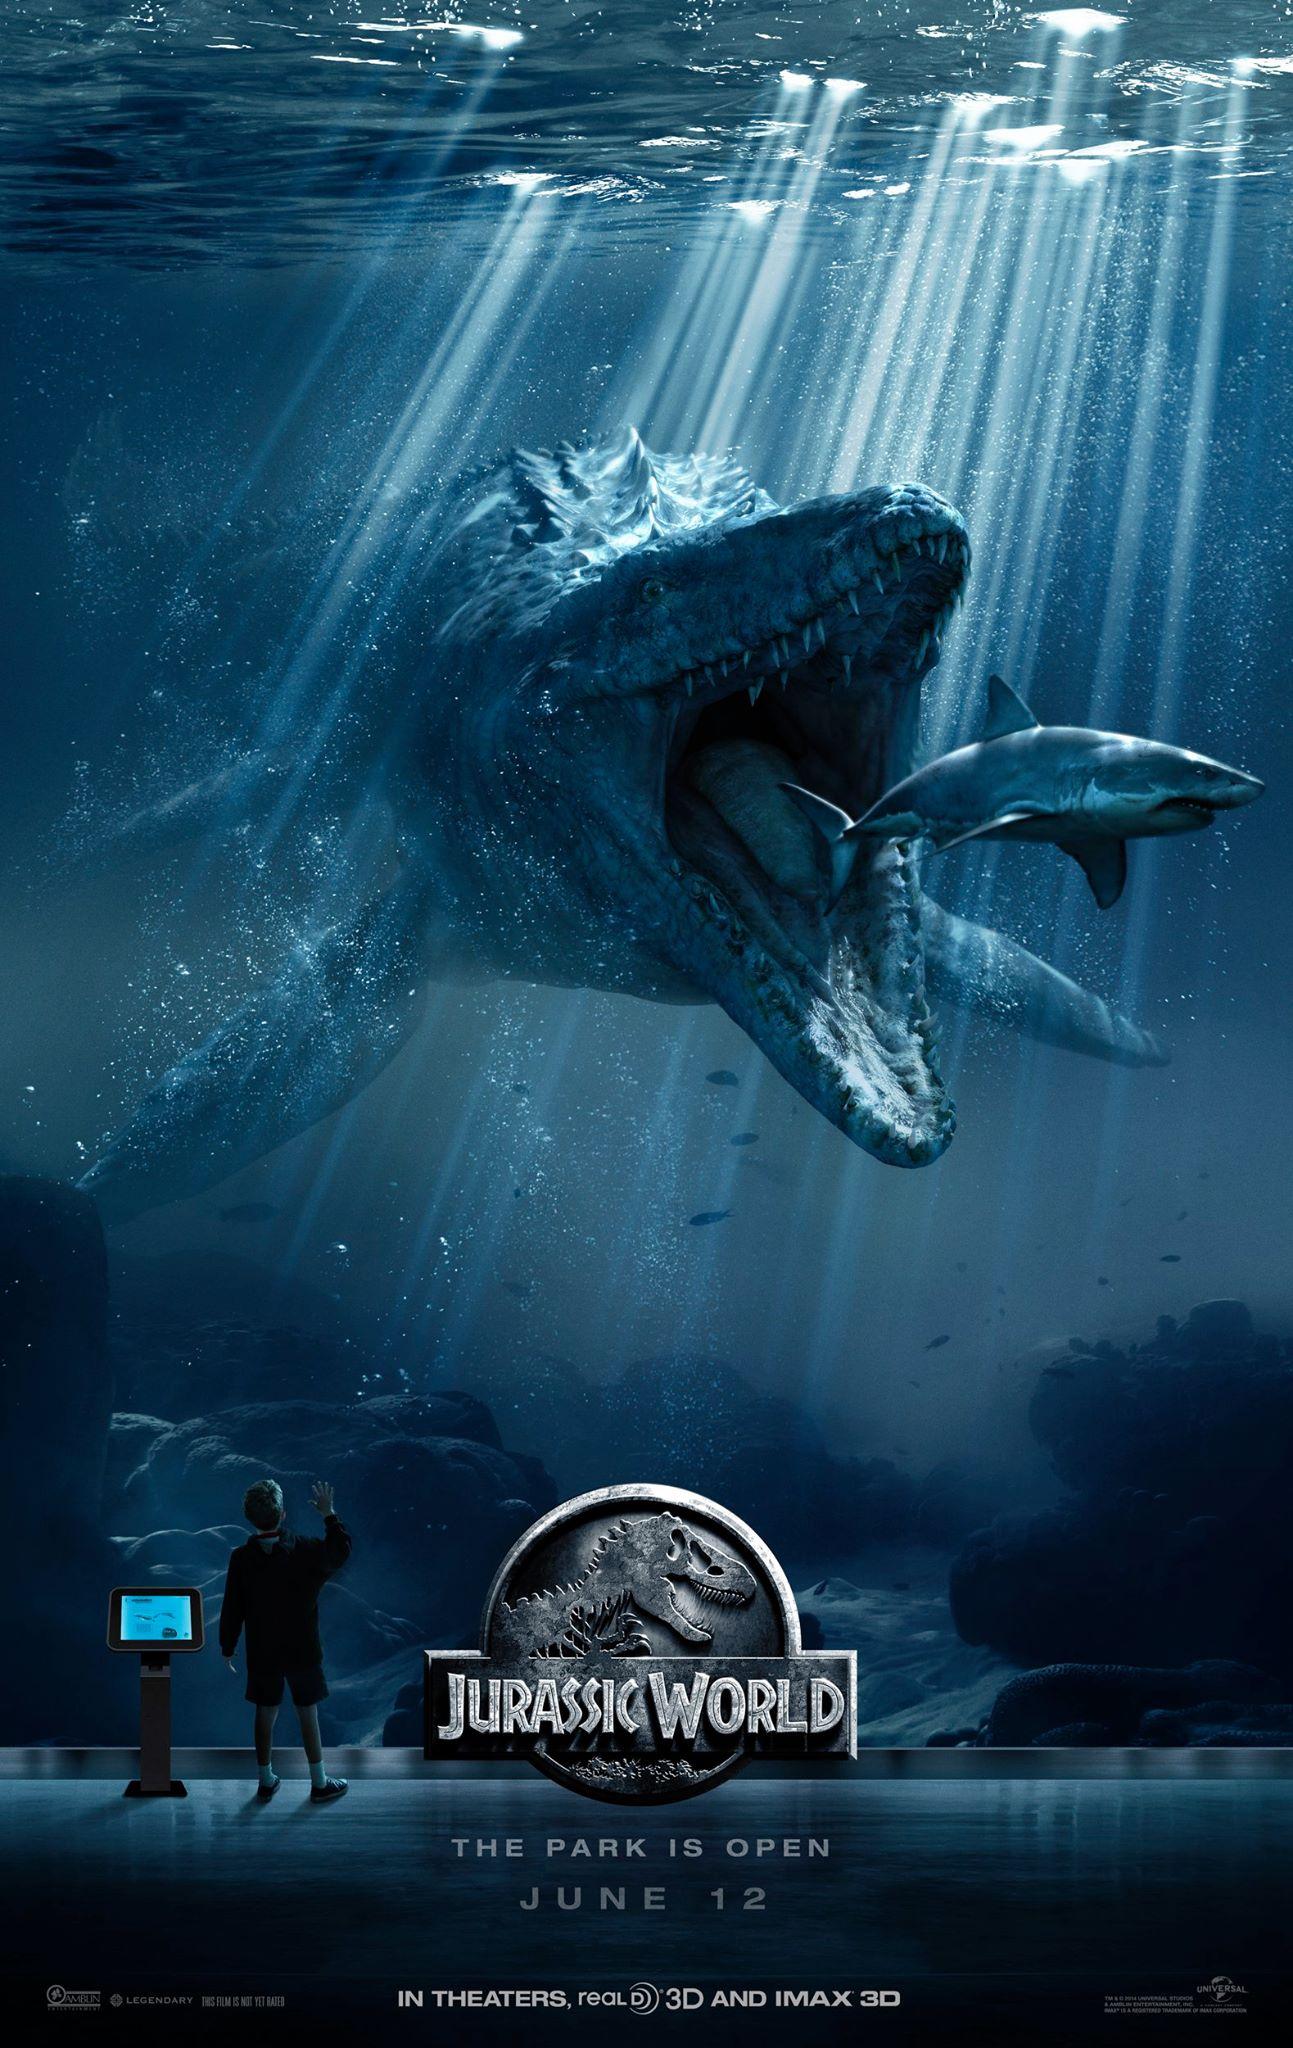 Jurassic World: un Mosasaurus, creatura subacquea preistorica nel poster